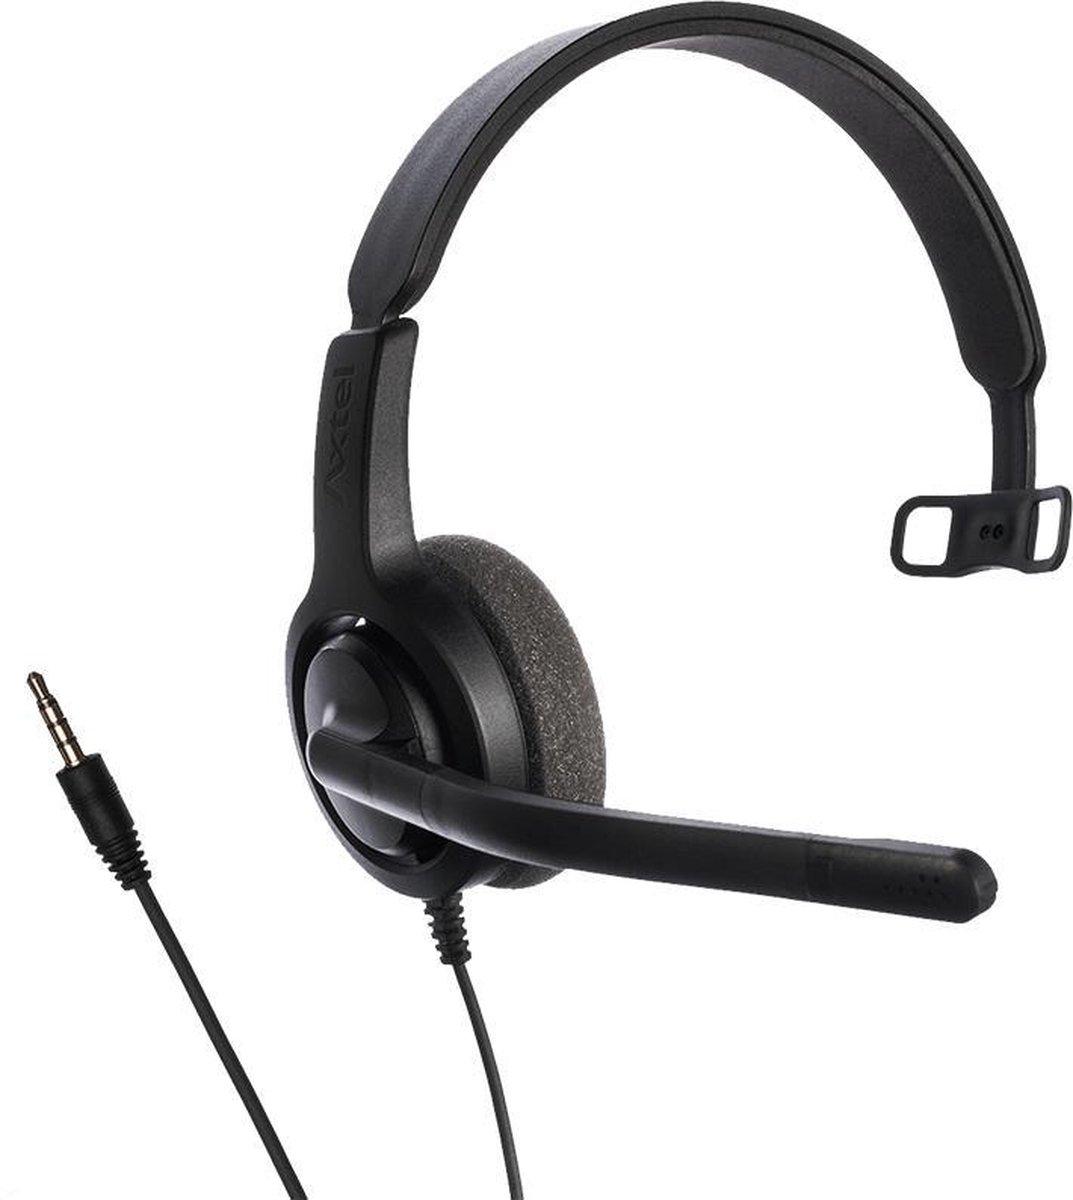 Axtel Voice PC28 mono 3,5mm jack koptelefoon (voor PC/Laptop/Tablet/Telefoon)